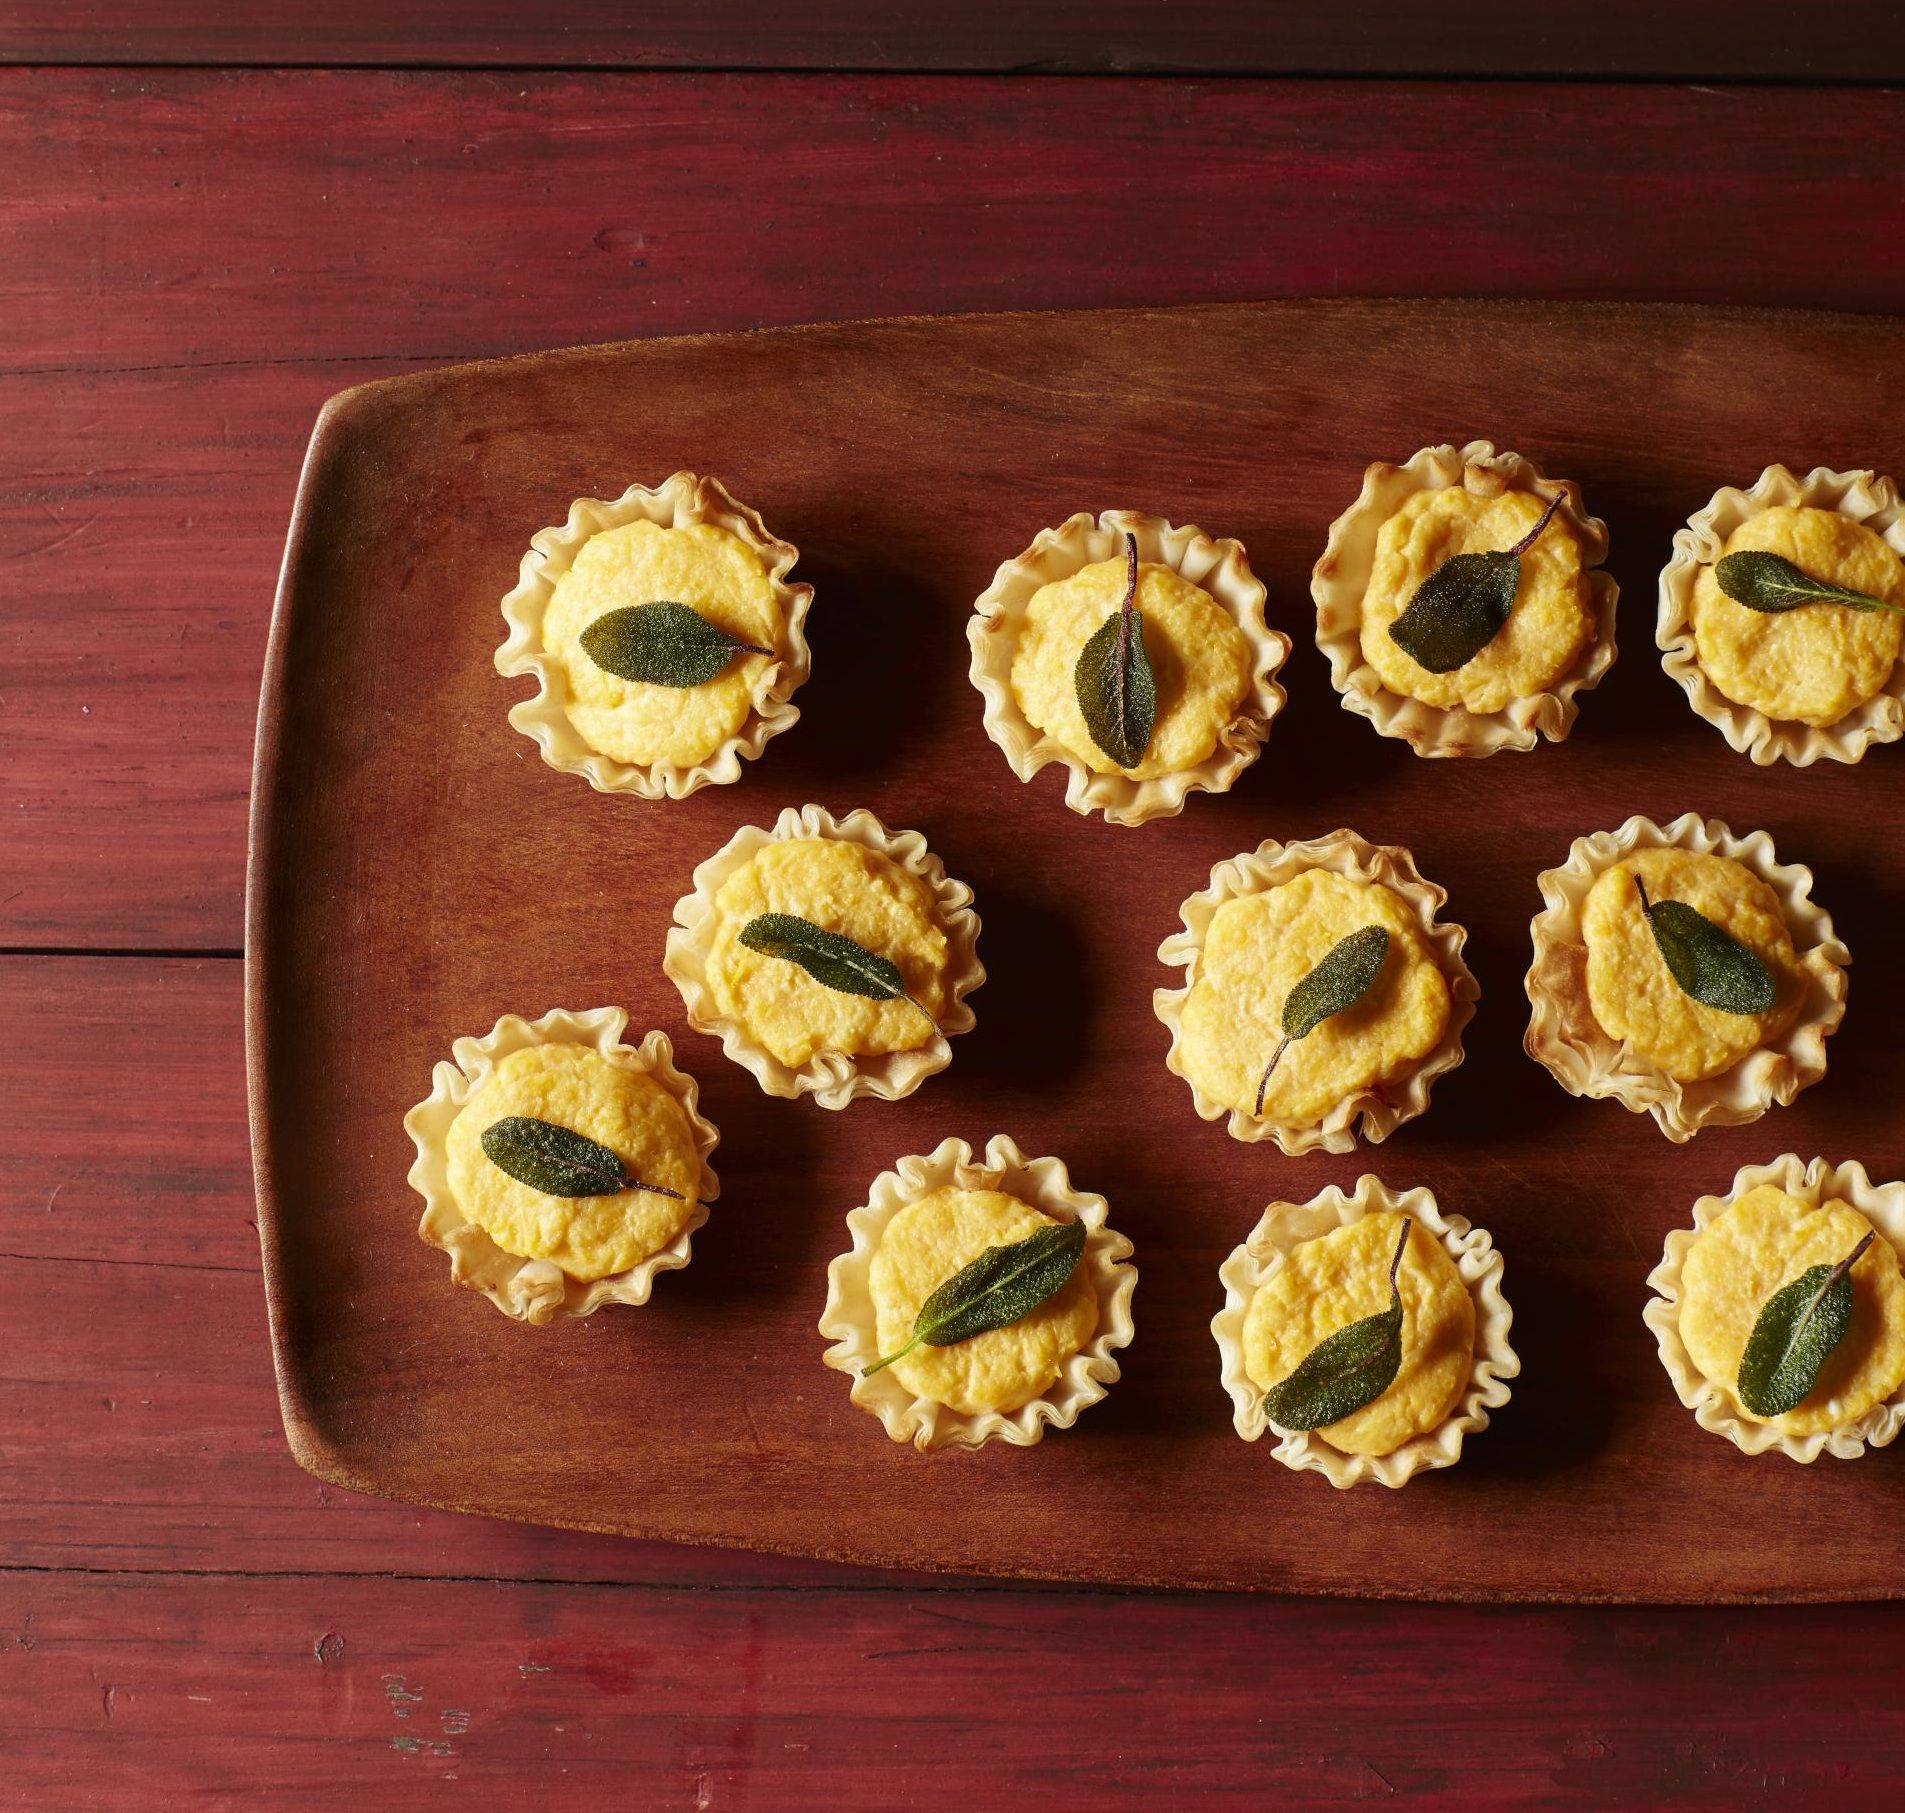 Butternut Squash-Goat Cheese Bites #myplate #fall #vegetables